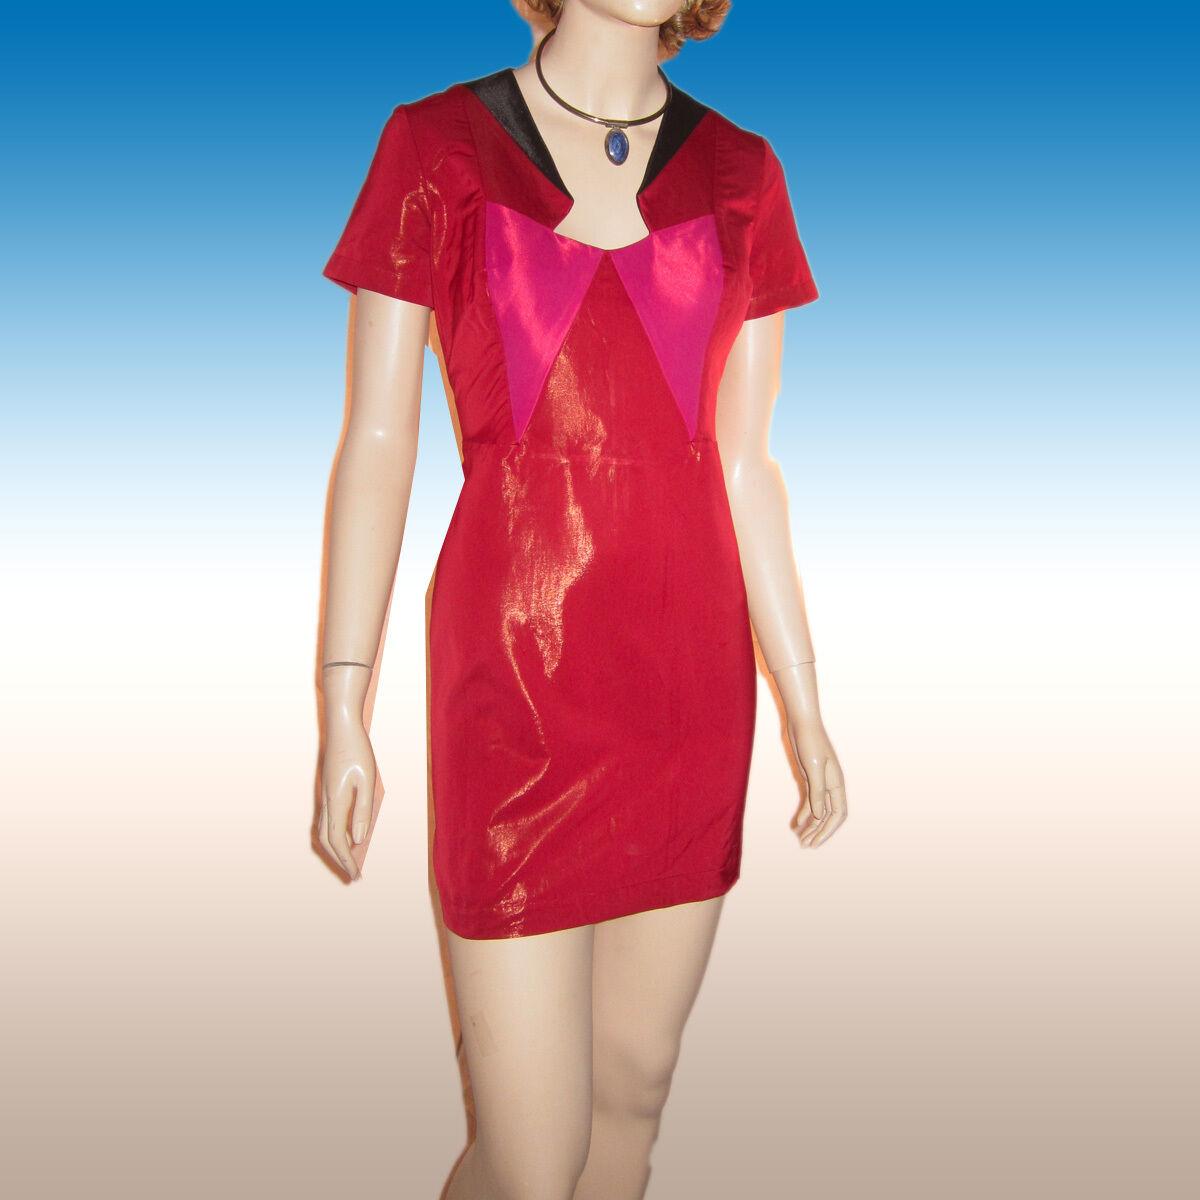 Nwt Ana Verriegelung Kleid Gr. UK 8 Dreifarbig Block Kontur Mantel Lack-Optik